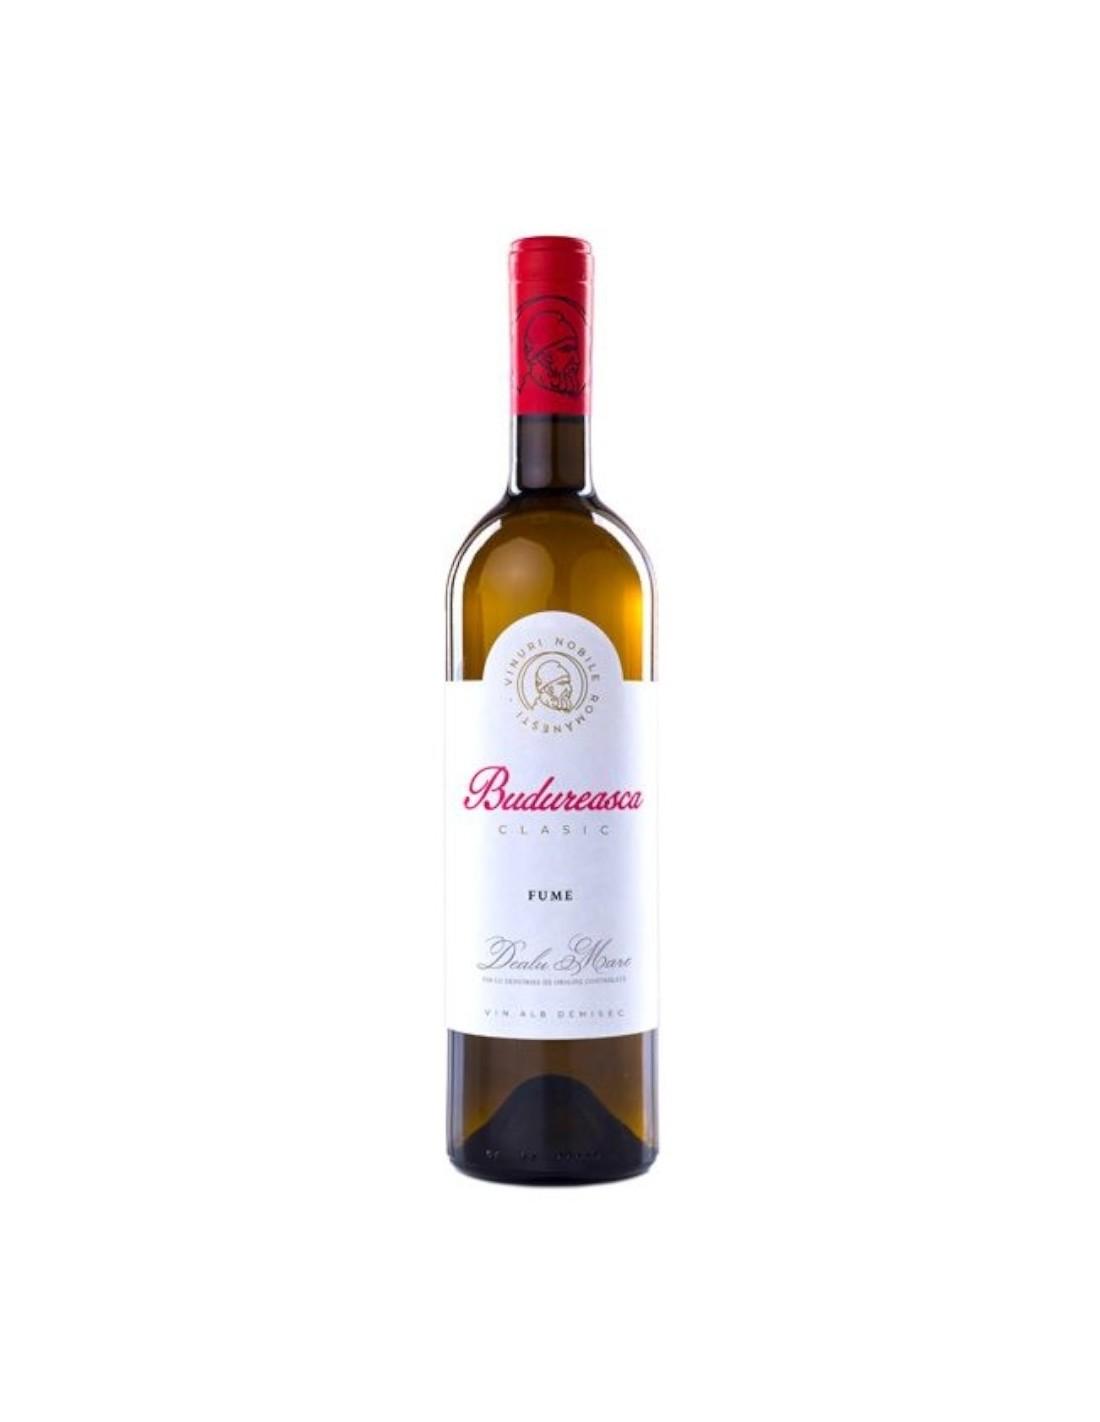 Vin alb demisec, Fume, Budureasca Dealu Mare, 0.75L, 13.5% alc., Romania